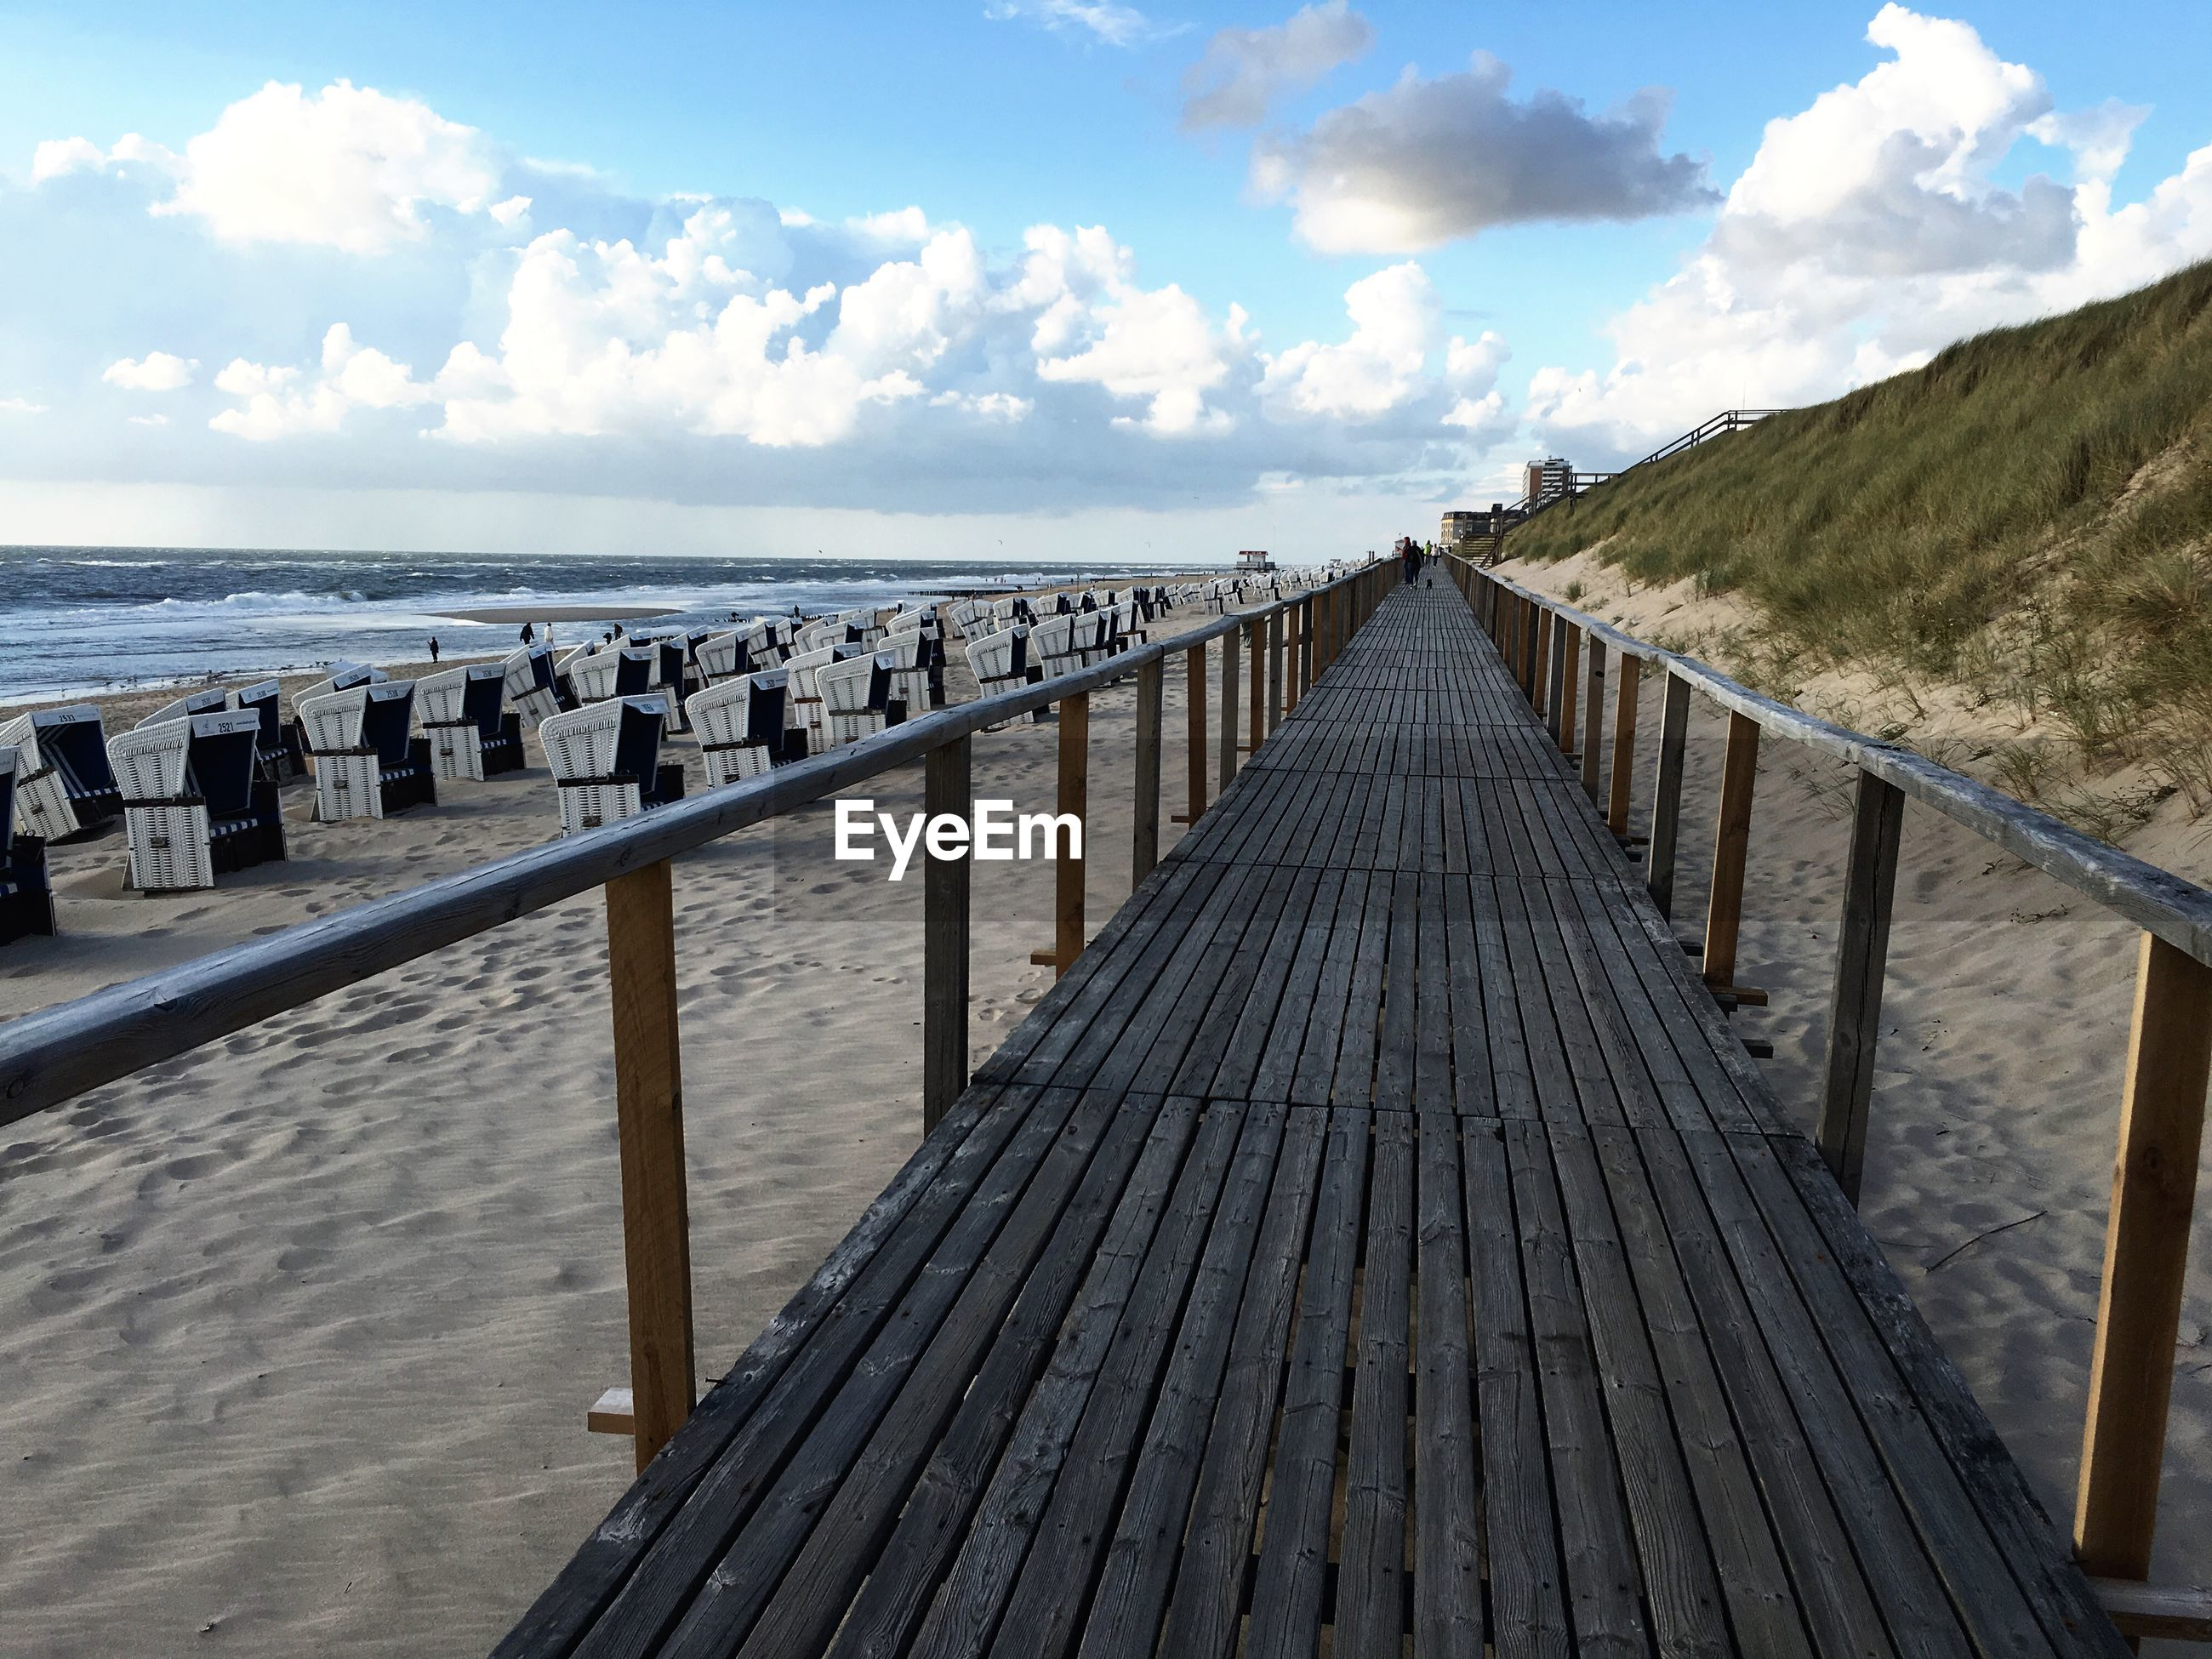 WOODEN WALKWAY LEADING TO SEA